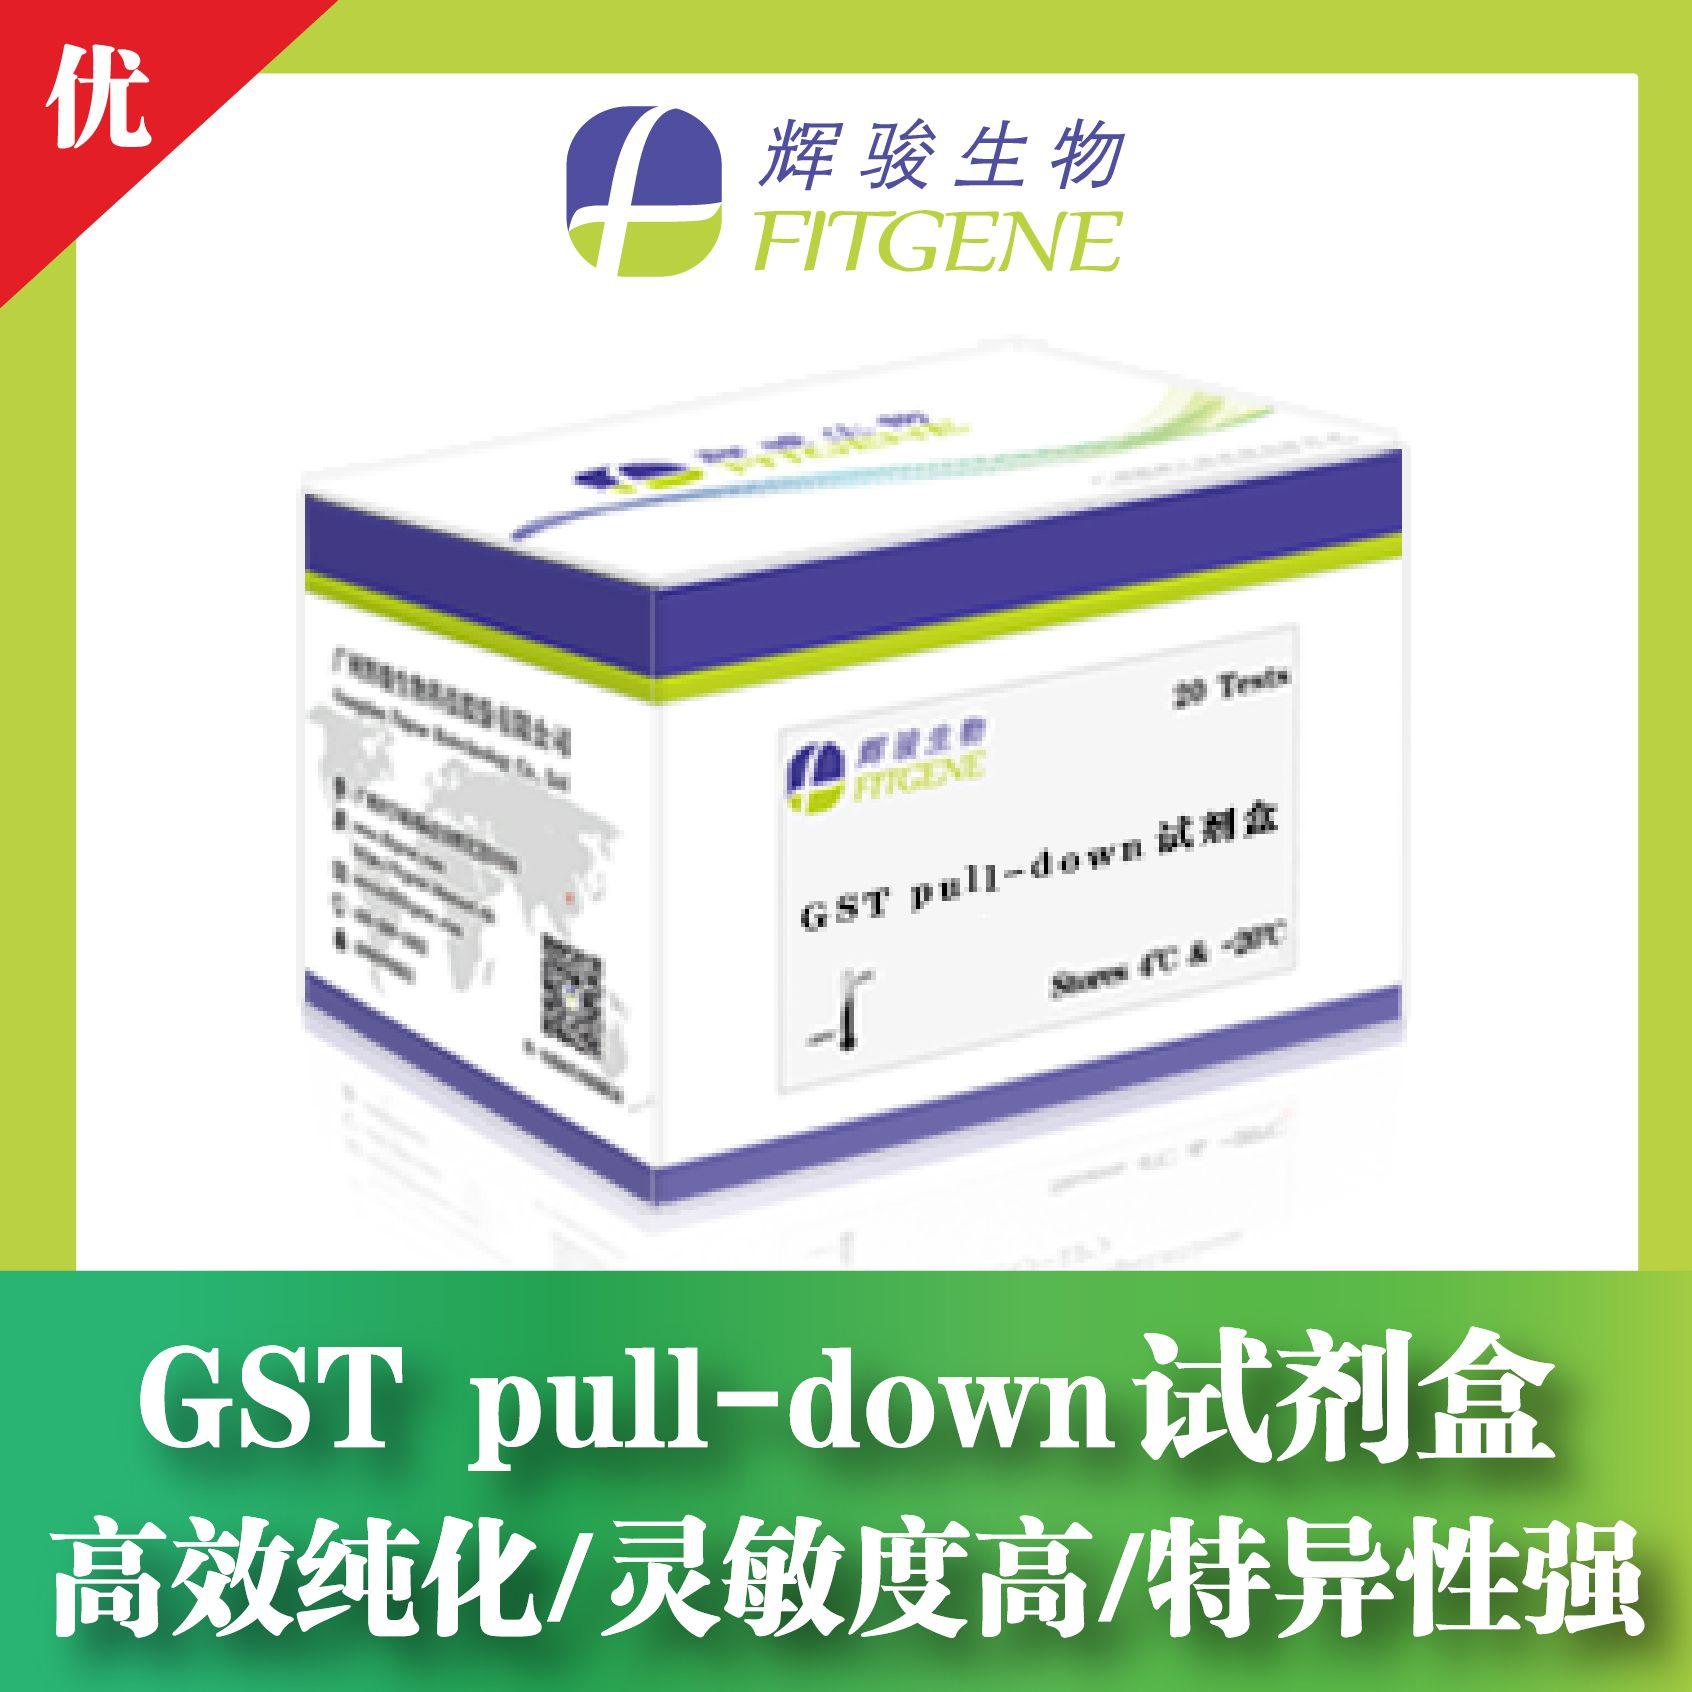 GST pull-down试剂盒-高效纯化/灵敏度高/特异性强-辉骏生物